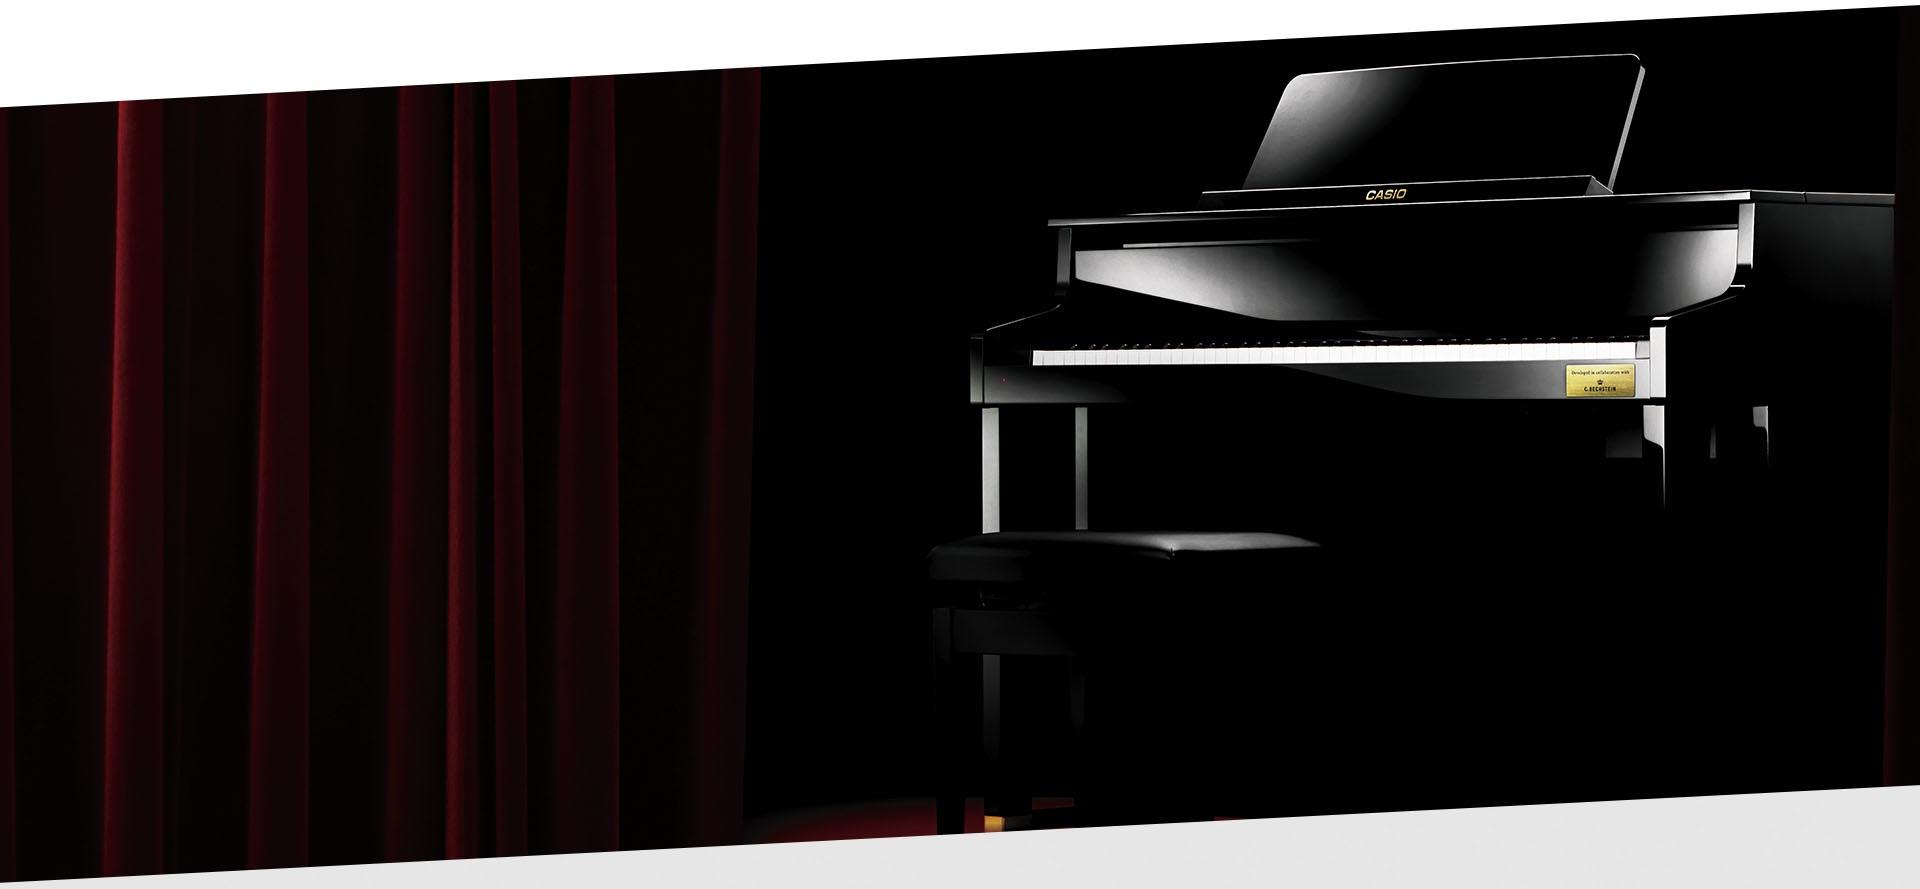 Concert piano black